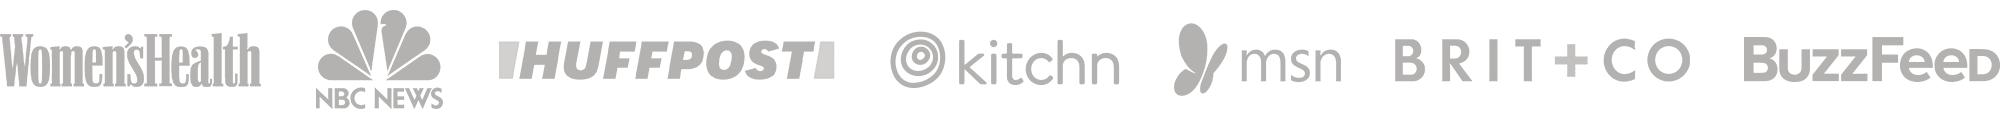 Press logos: Women's Health, NBC News, HuffPost, The Kitchen, MSN, Brit+Co, Buzzfeed